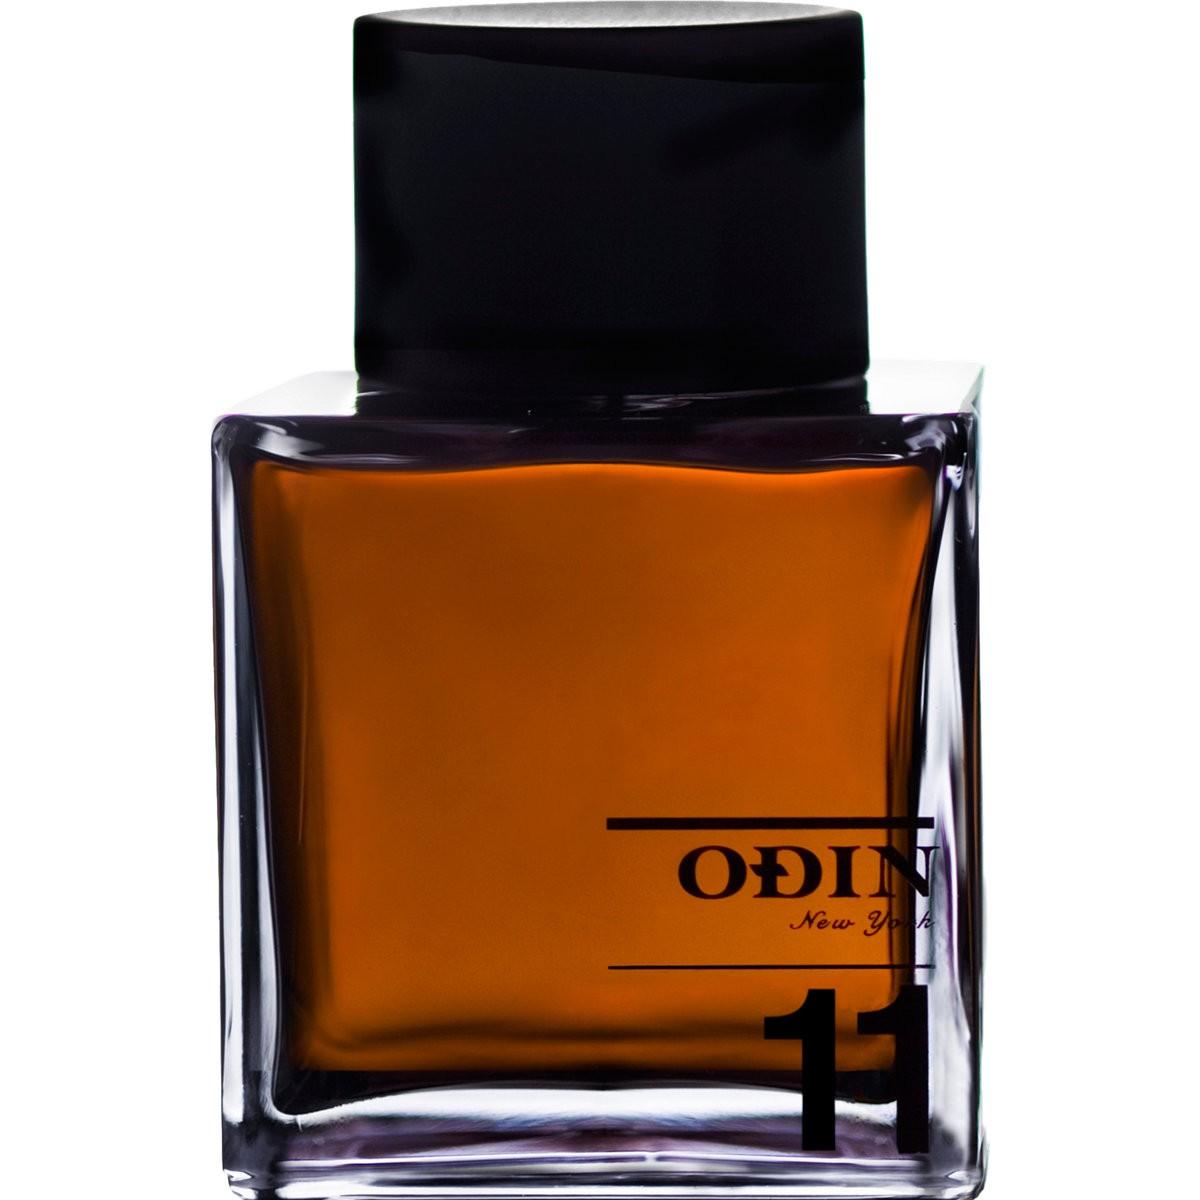 Odin New York Odin 11 Semma аромат для мужчин и женщин